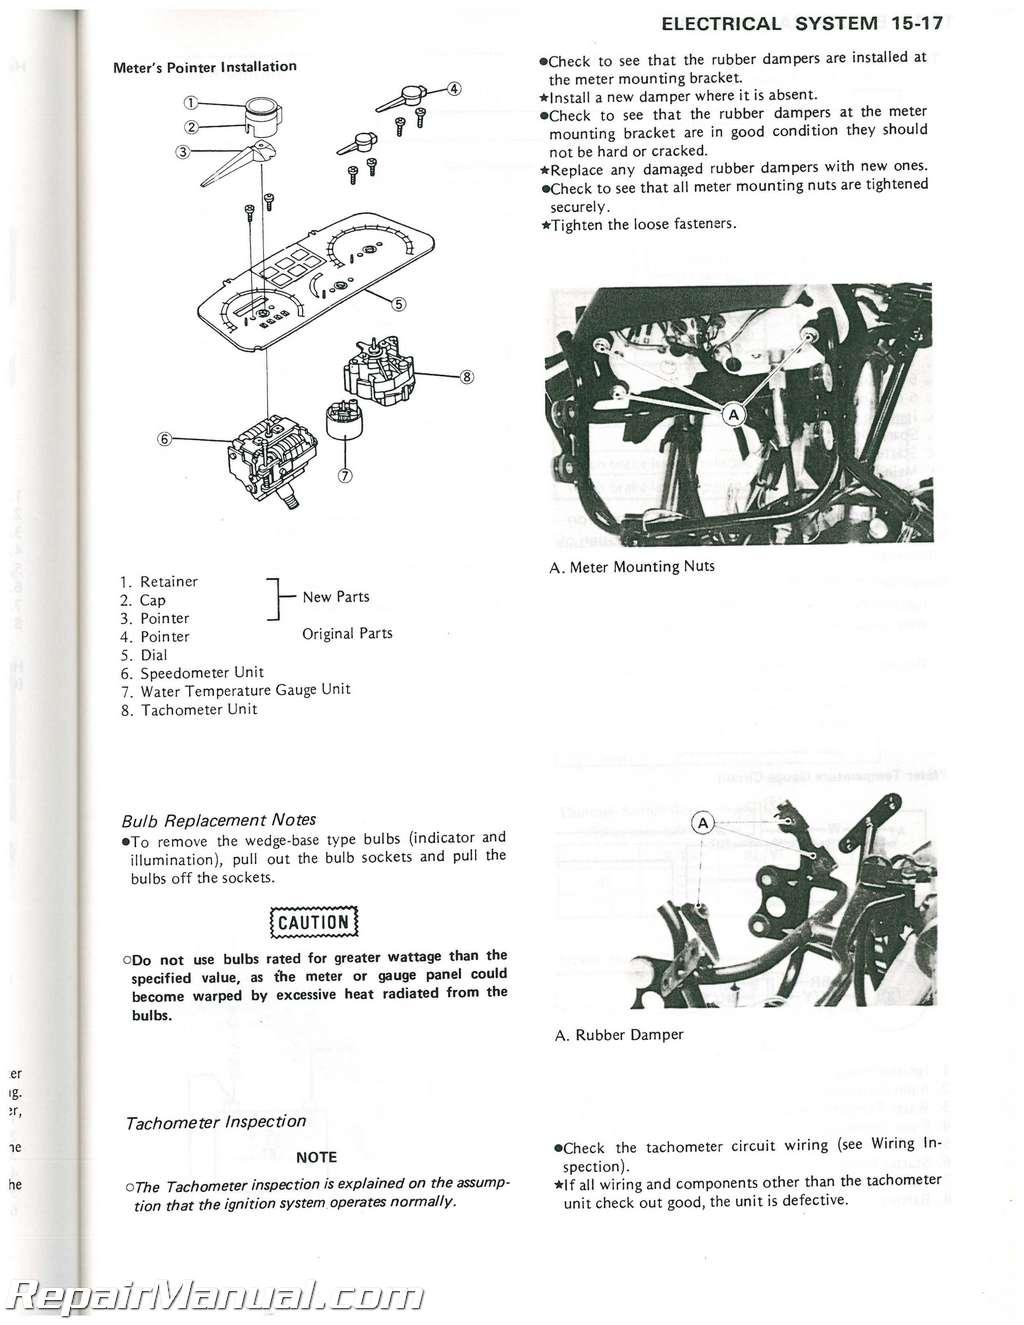 Kawasaki Ex500 Wiring Schematic Trusted Schematics Diagram 1988 A1 Gpz Motorcycle Service Manual Supplement Bayou 220